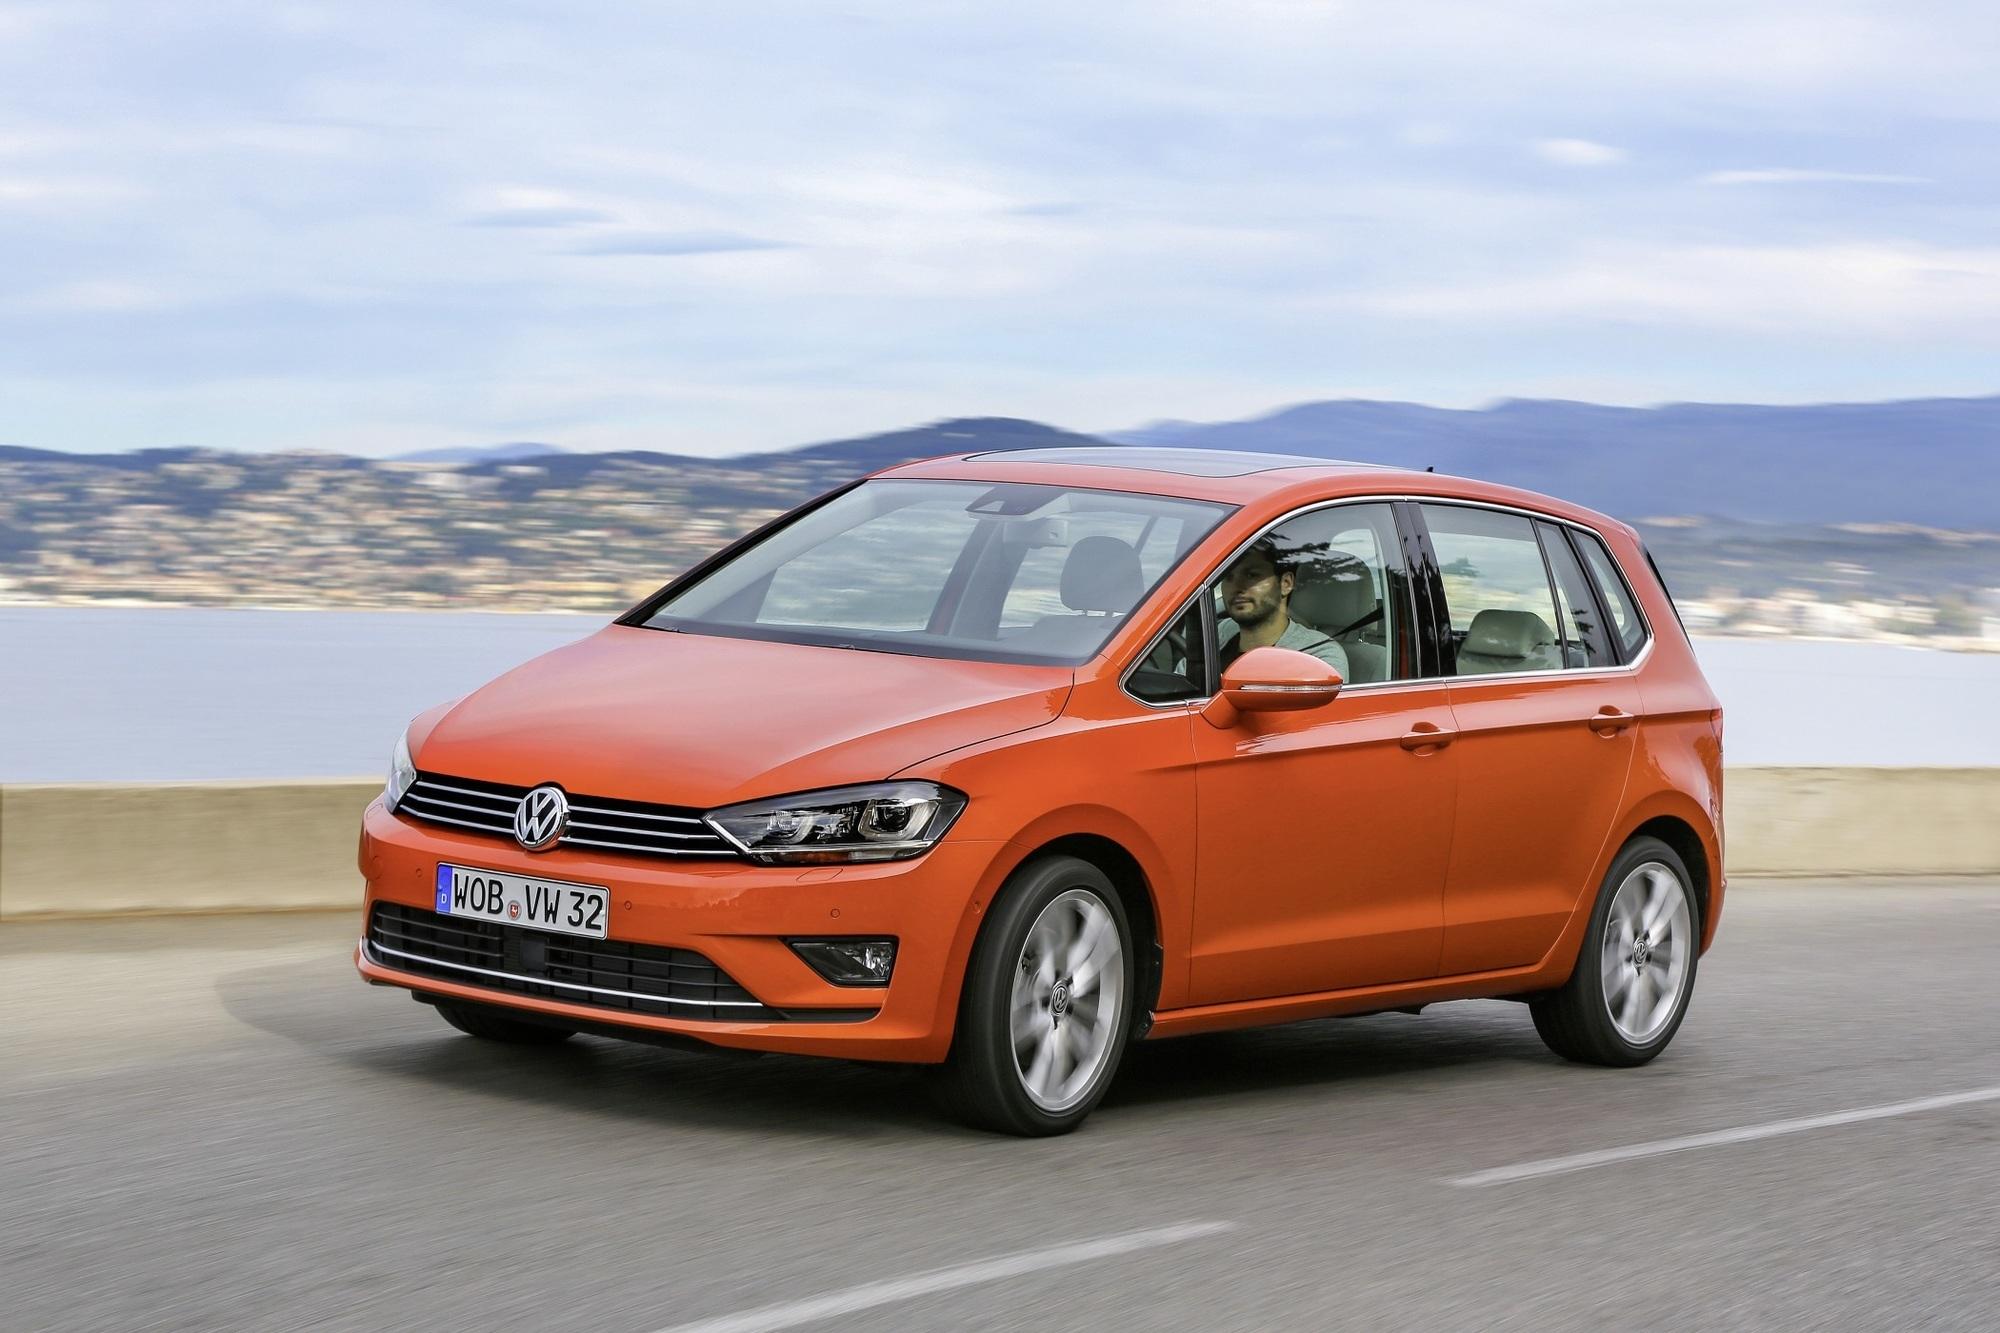 Test: VW Golf Sportsvan - Plus minus plump